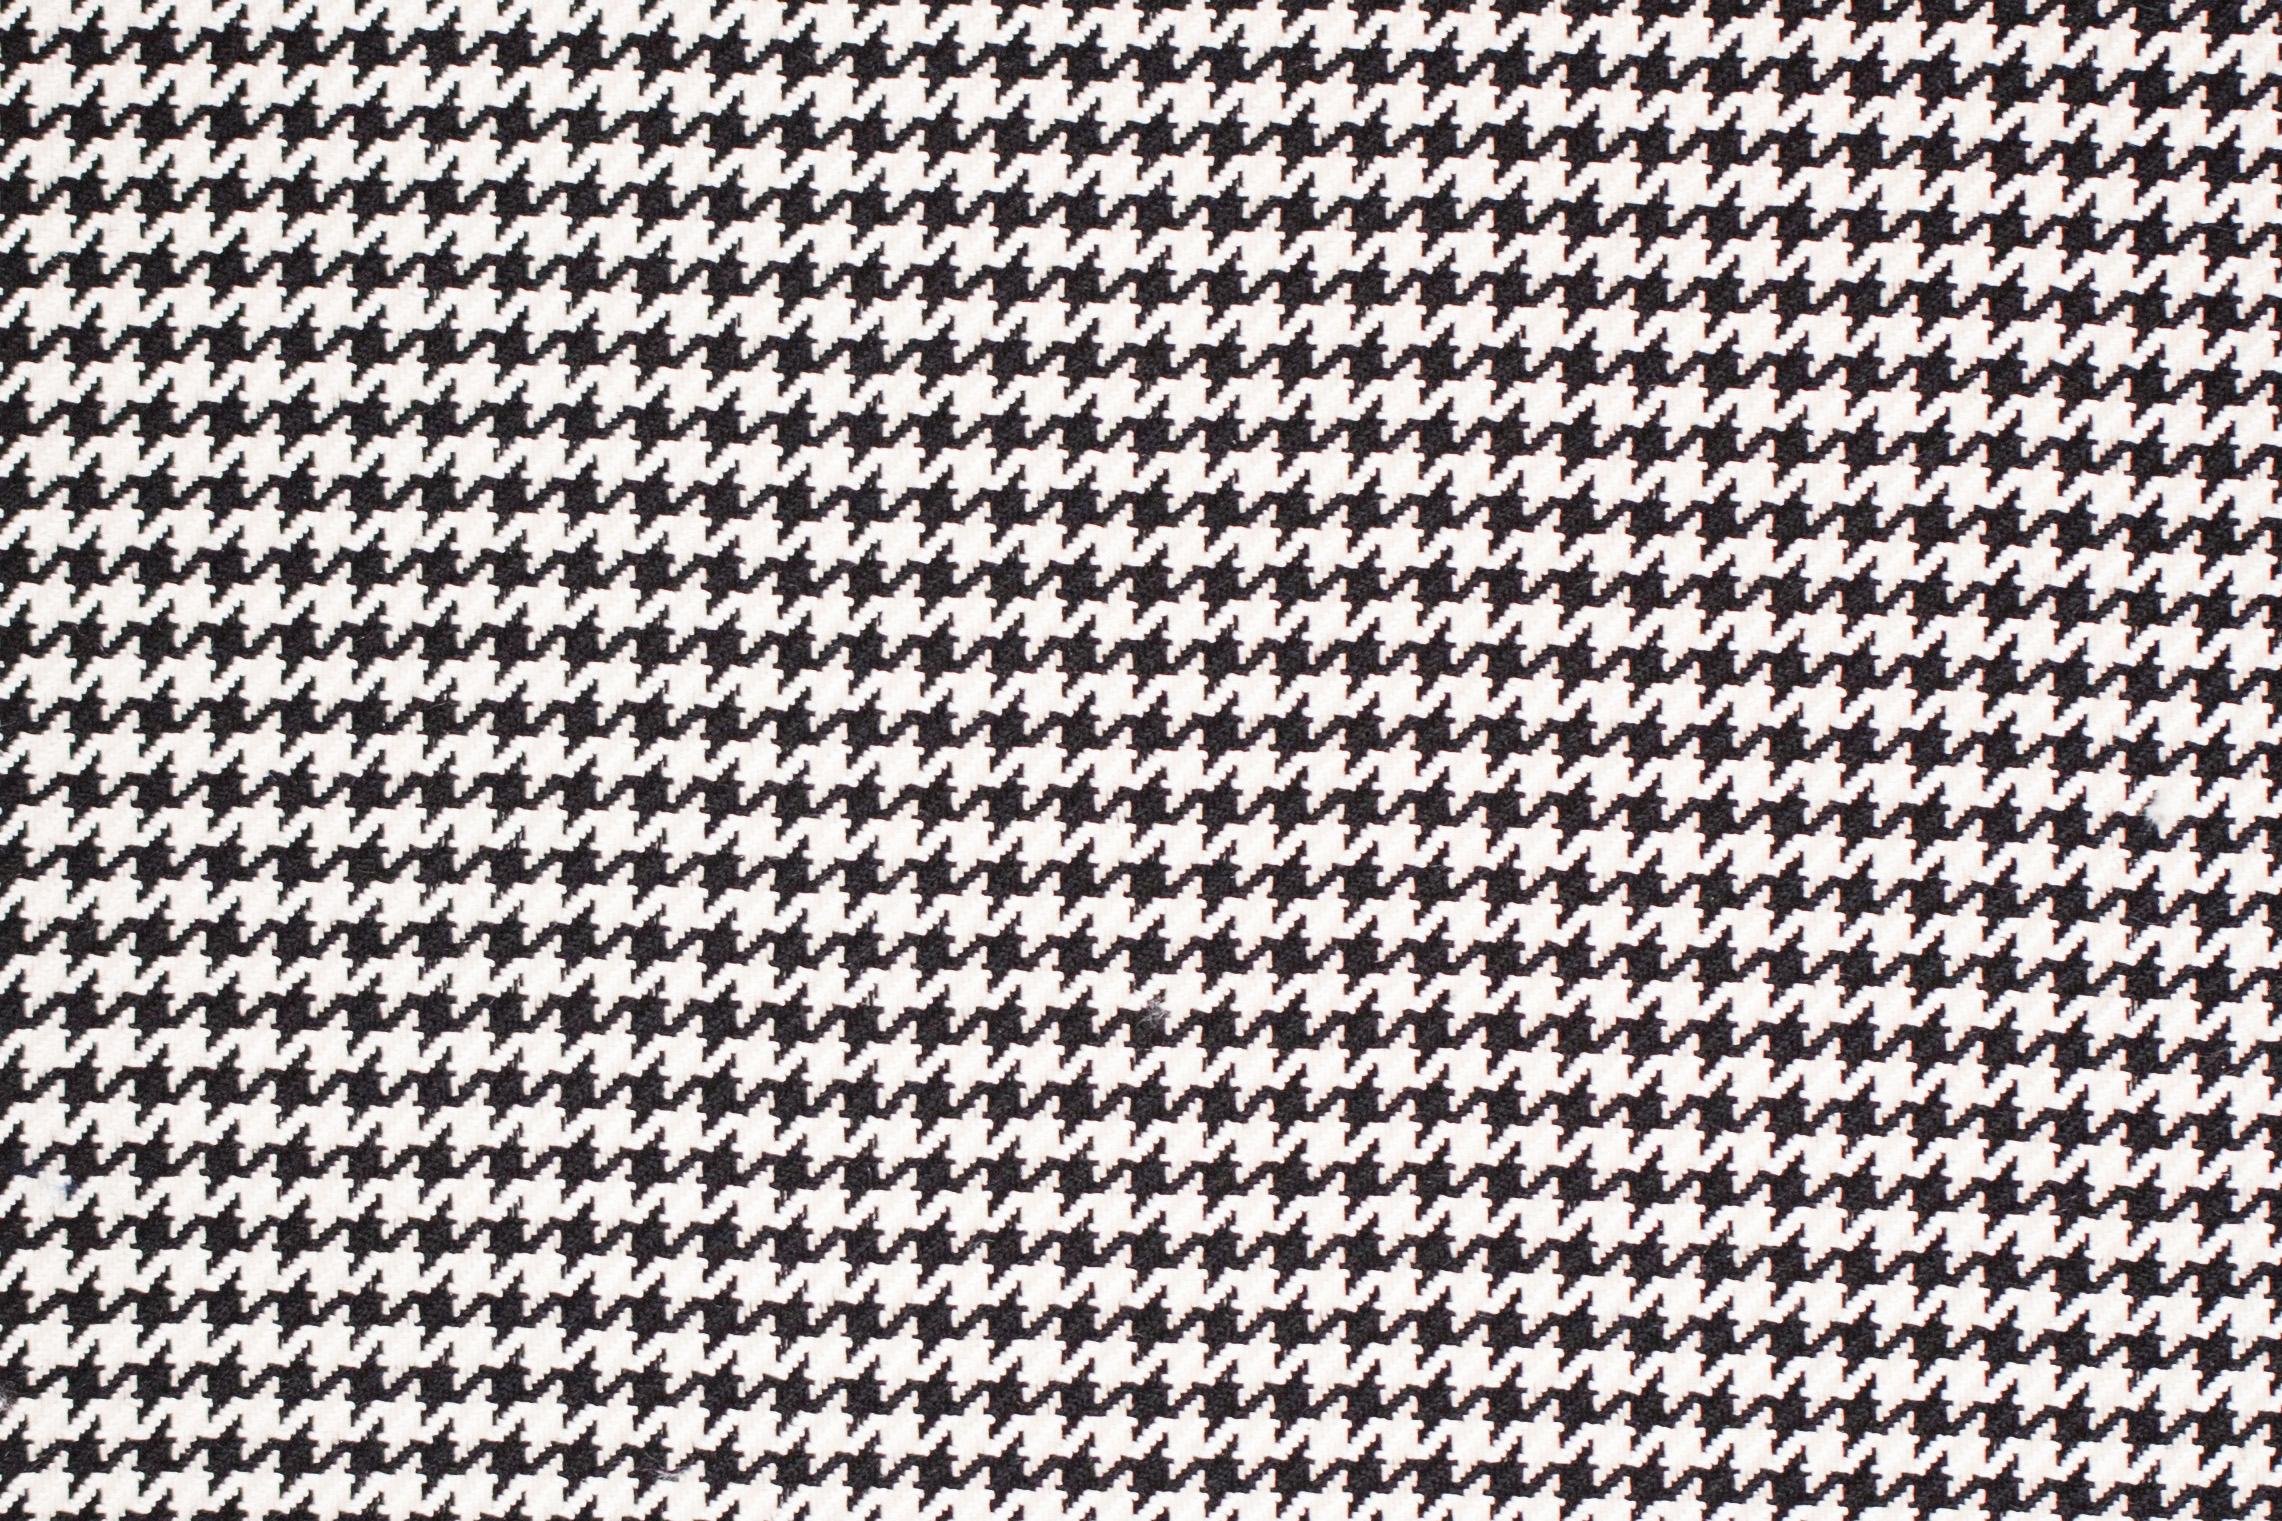 BA 449/23 BLACK/WHITE HOUNDSTOOTH